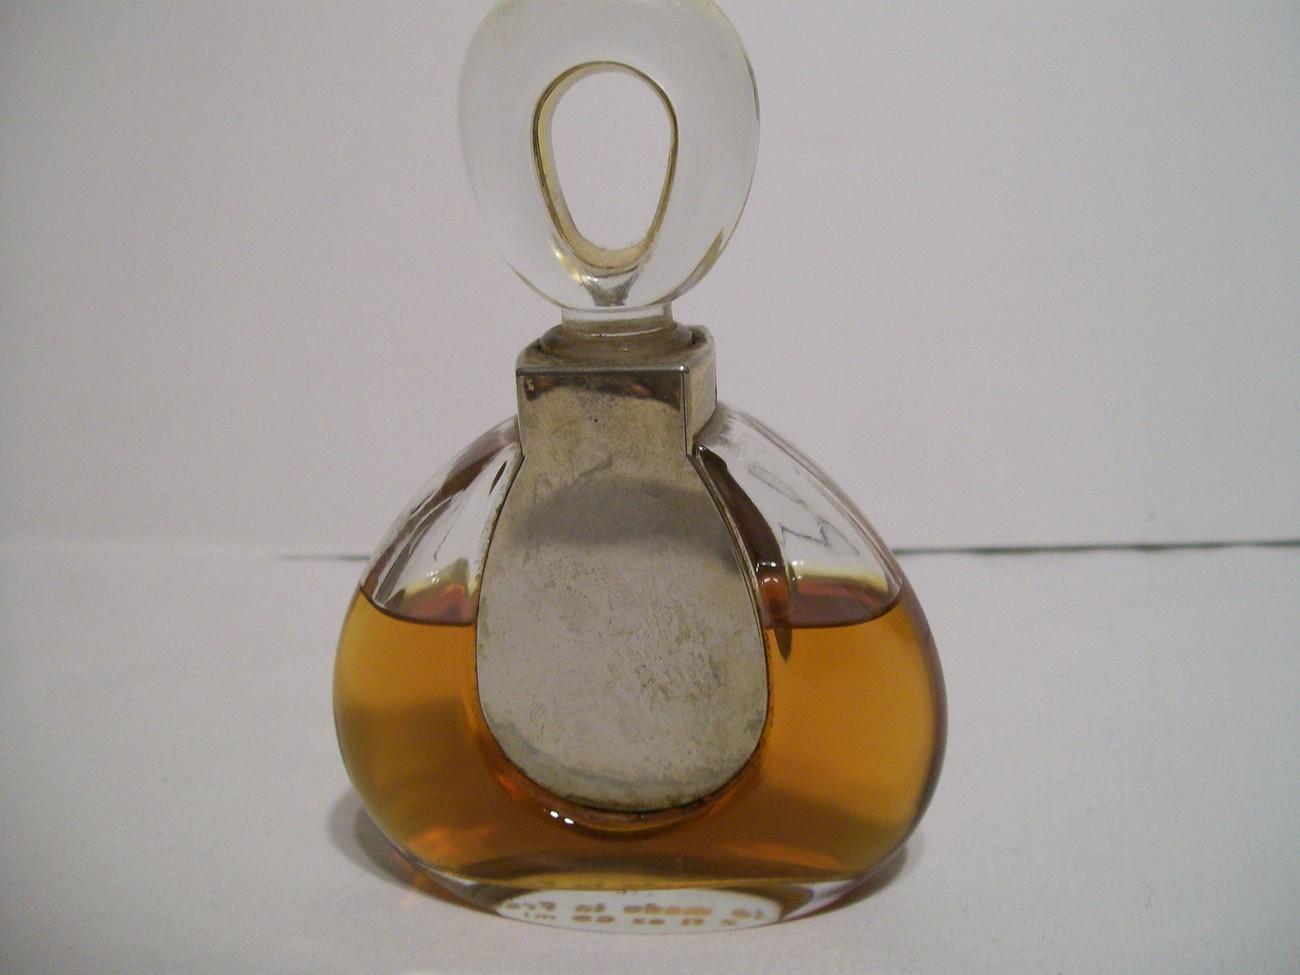 Vintage de Van Cleef & Arpels Paris First Perfume 2 oz